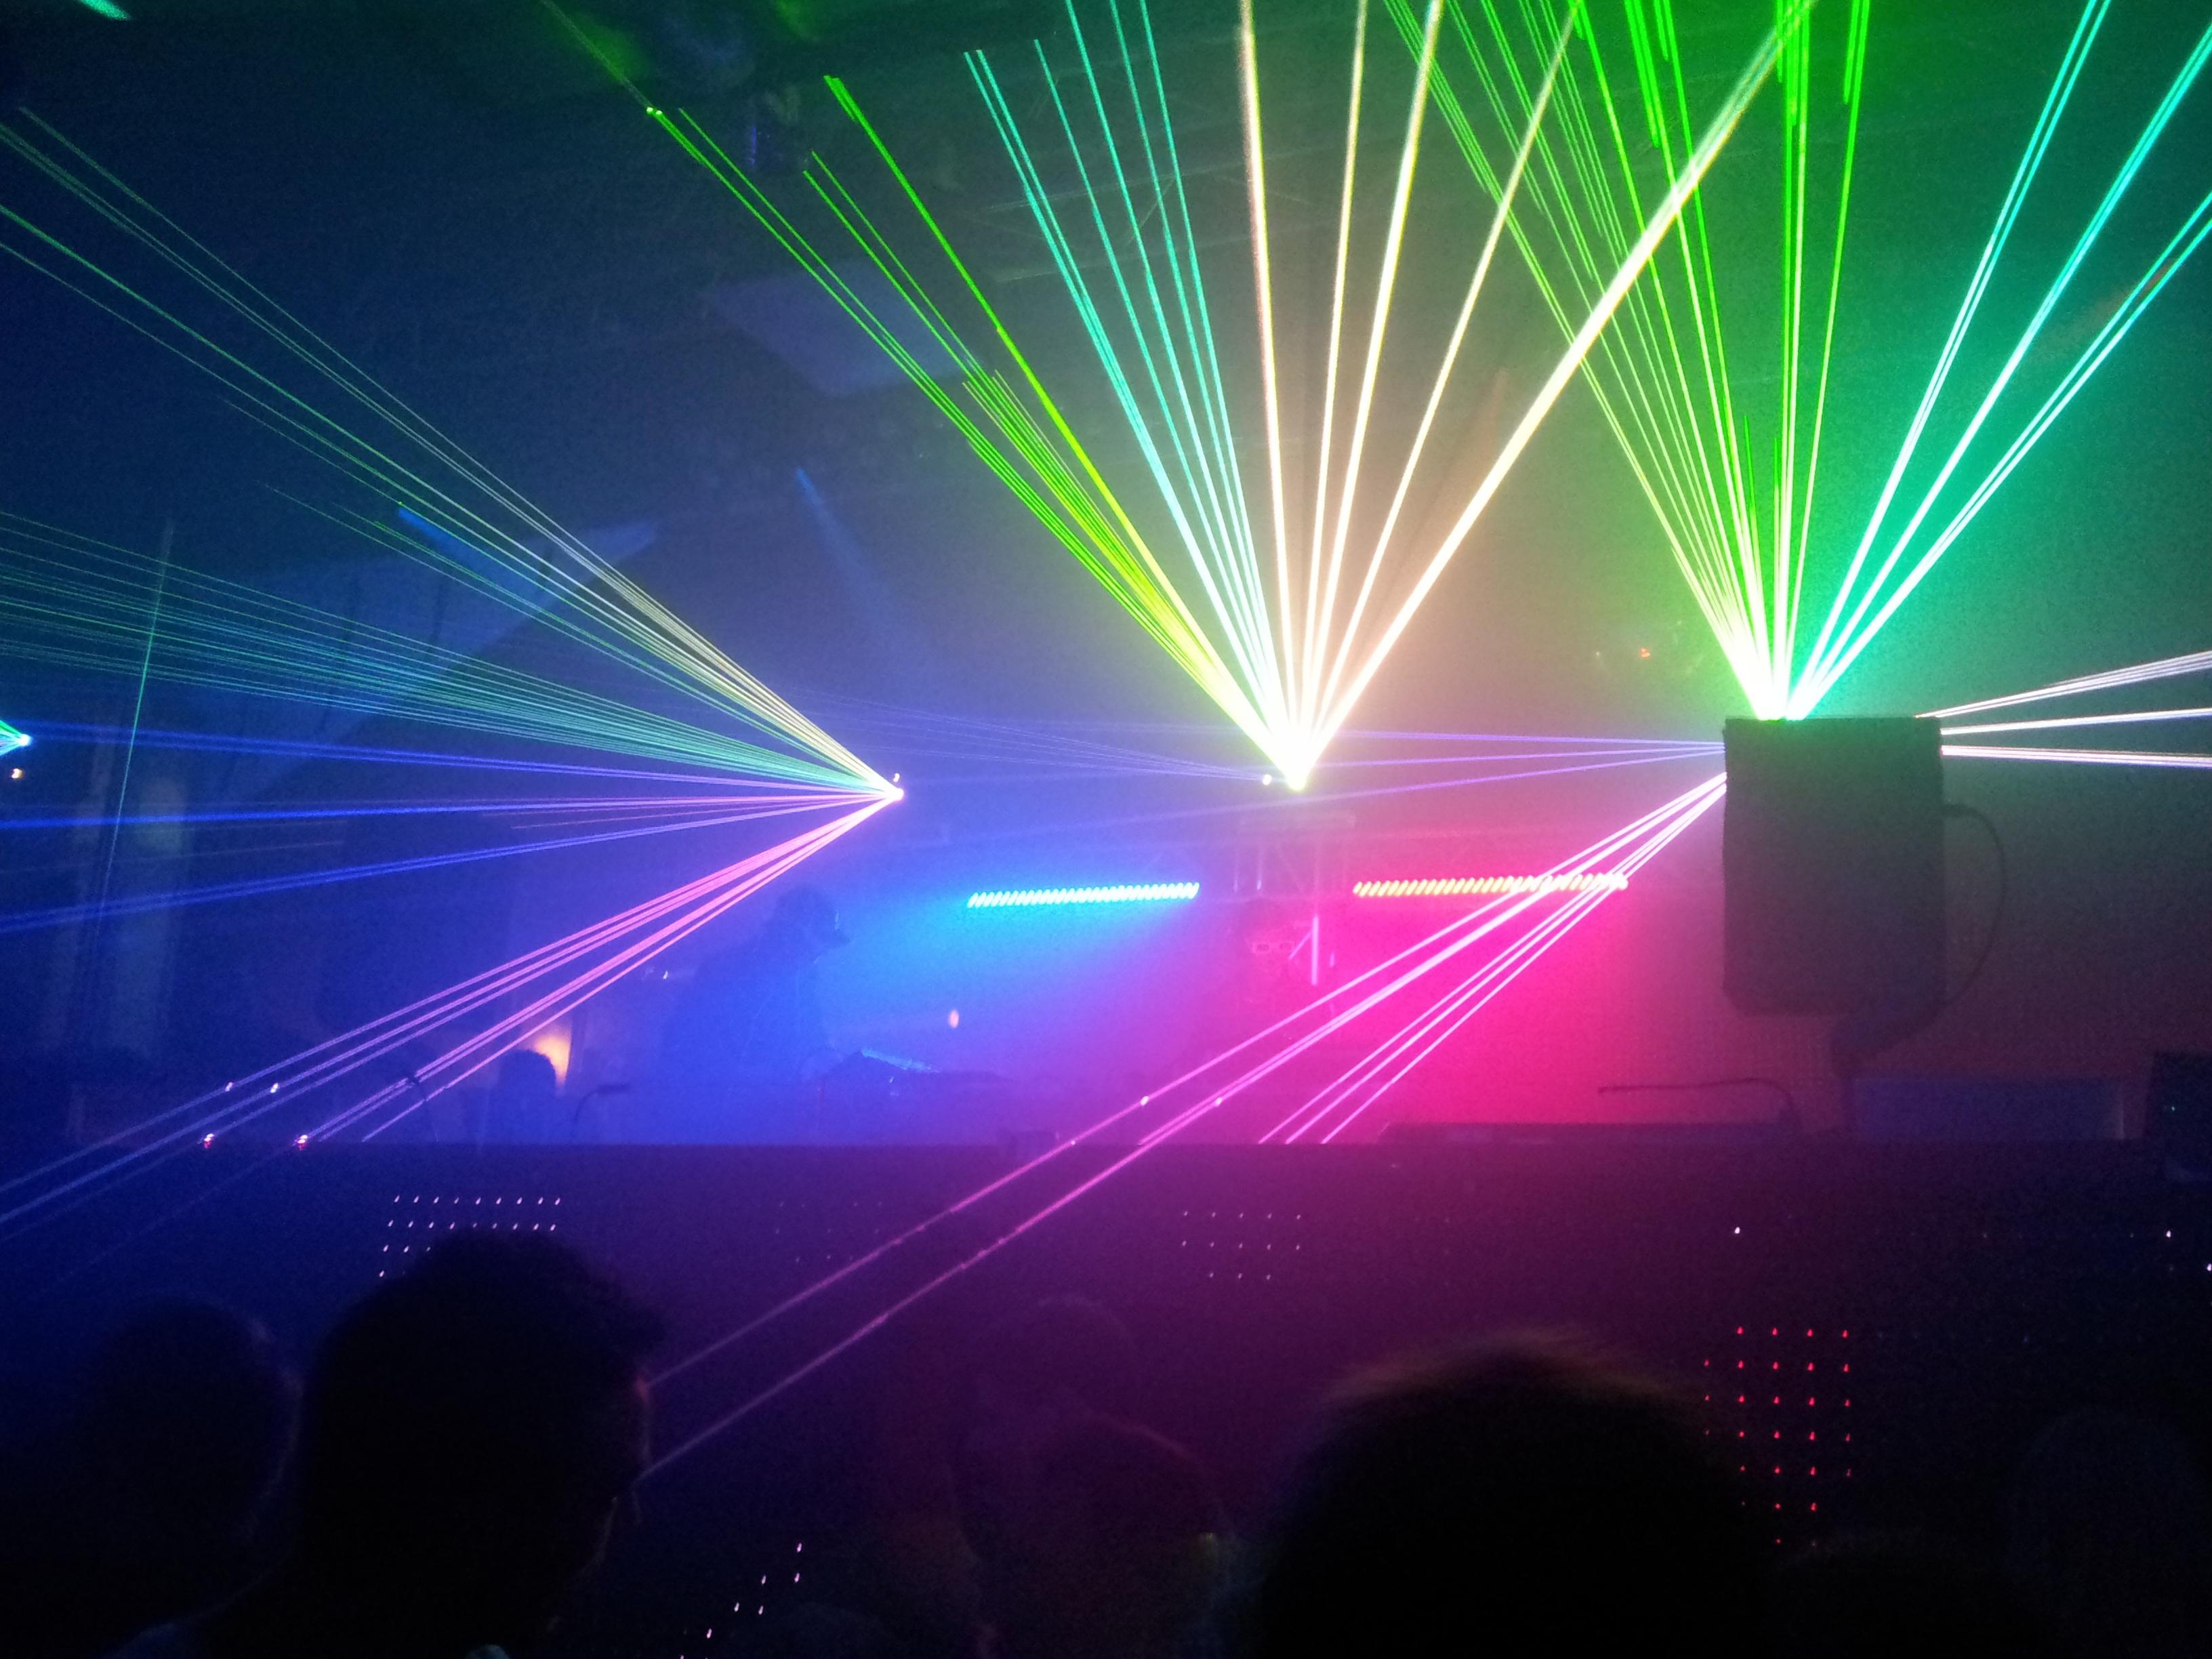 music-night-celebration-concert-evening-darkness-1332263-pxhere.com